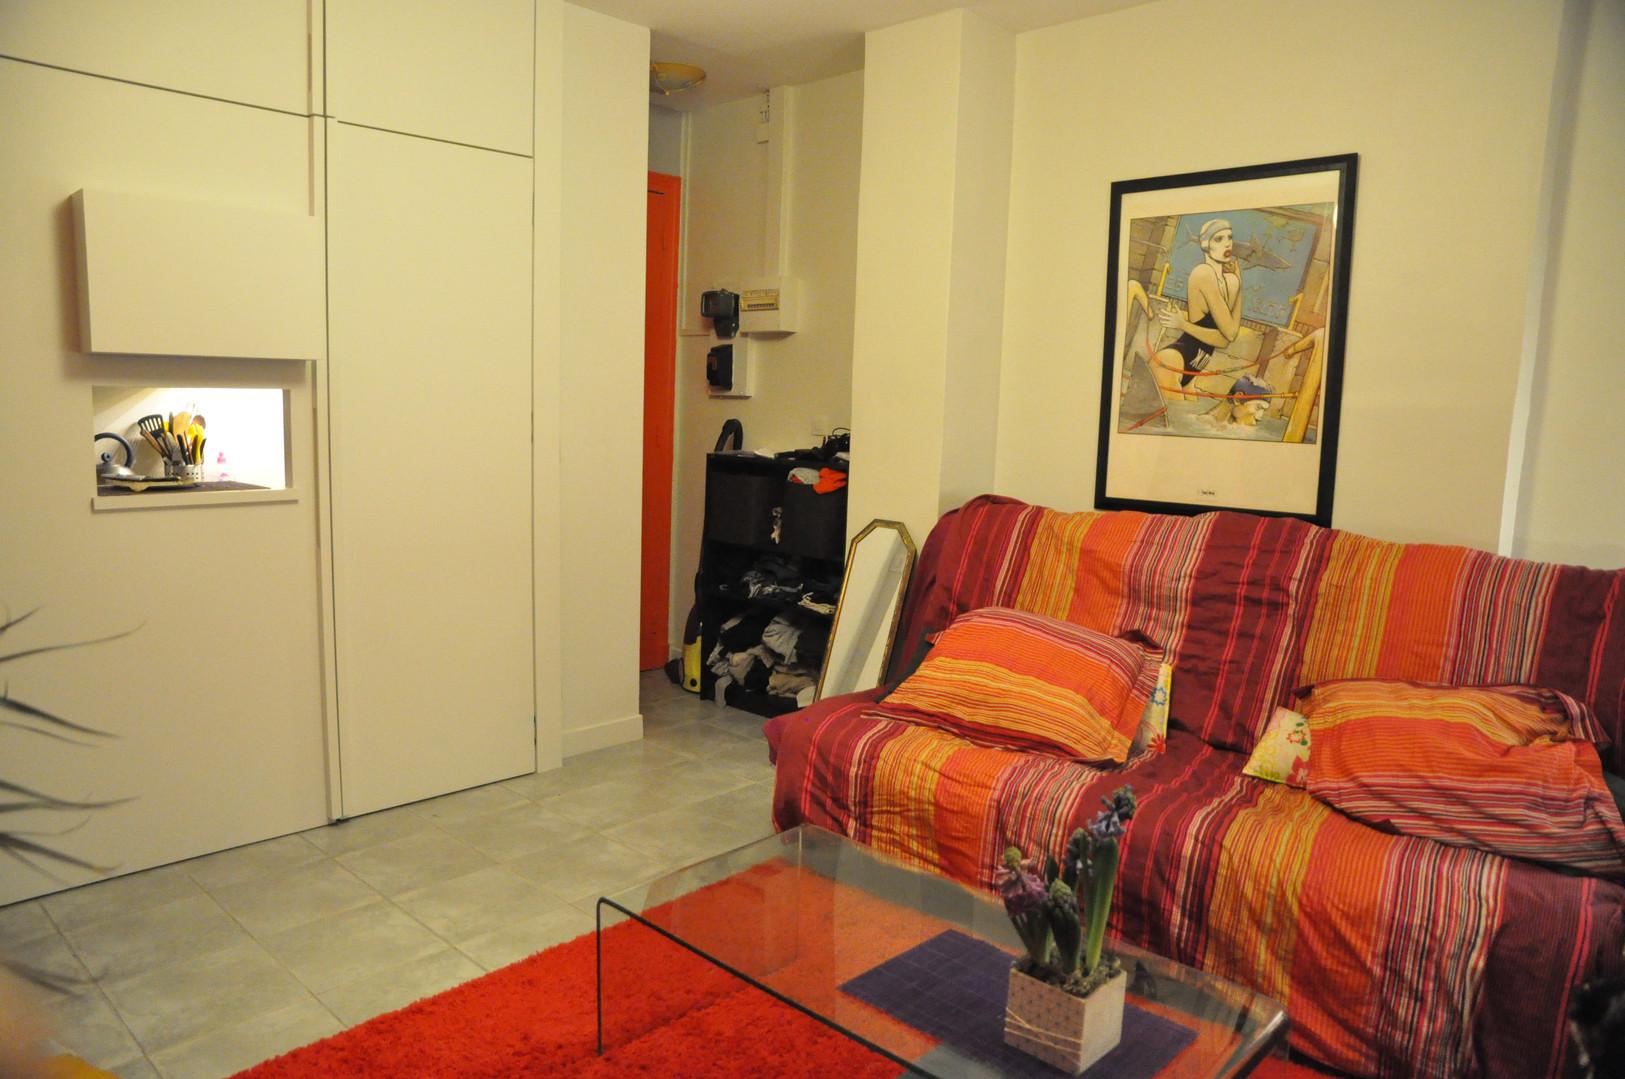 Aménagement optimal de petits espaces